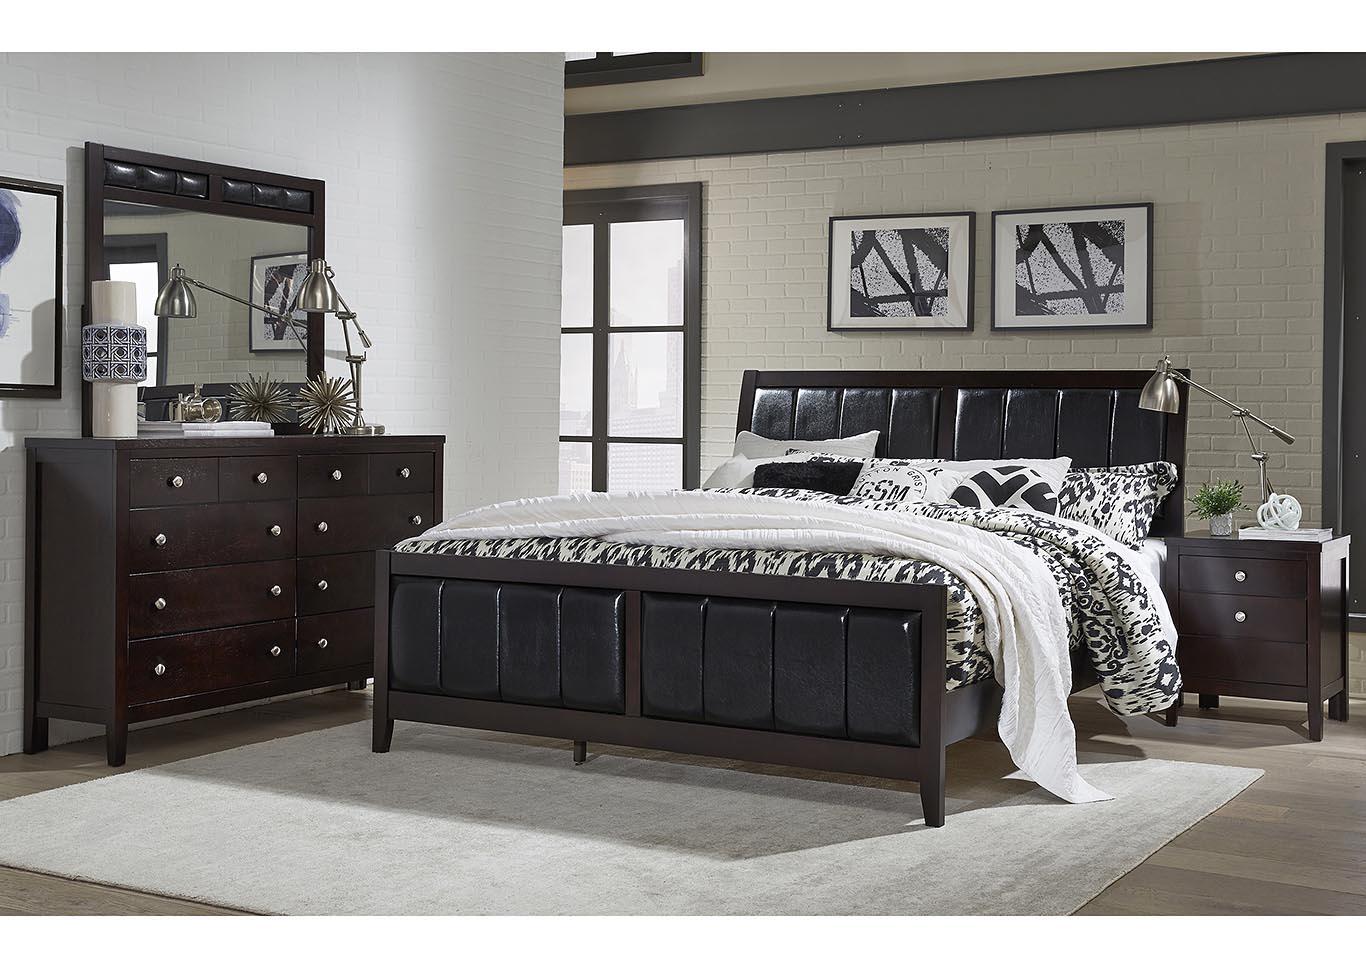 Frugal Furniture - Boston, Mattapan, Jamaica Plain ...